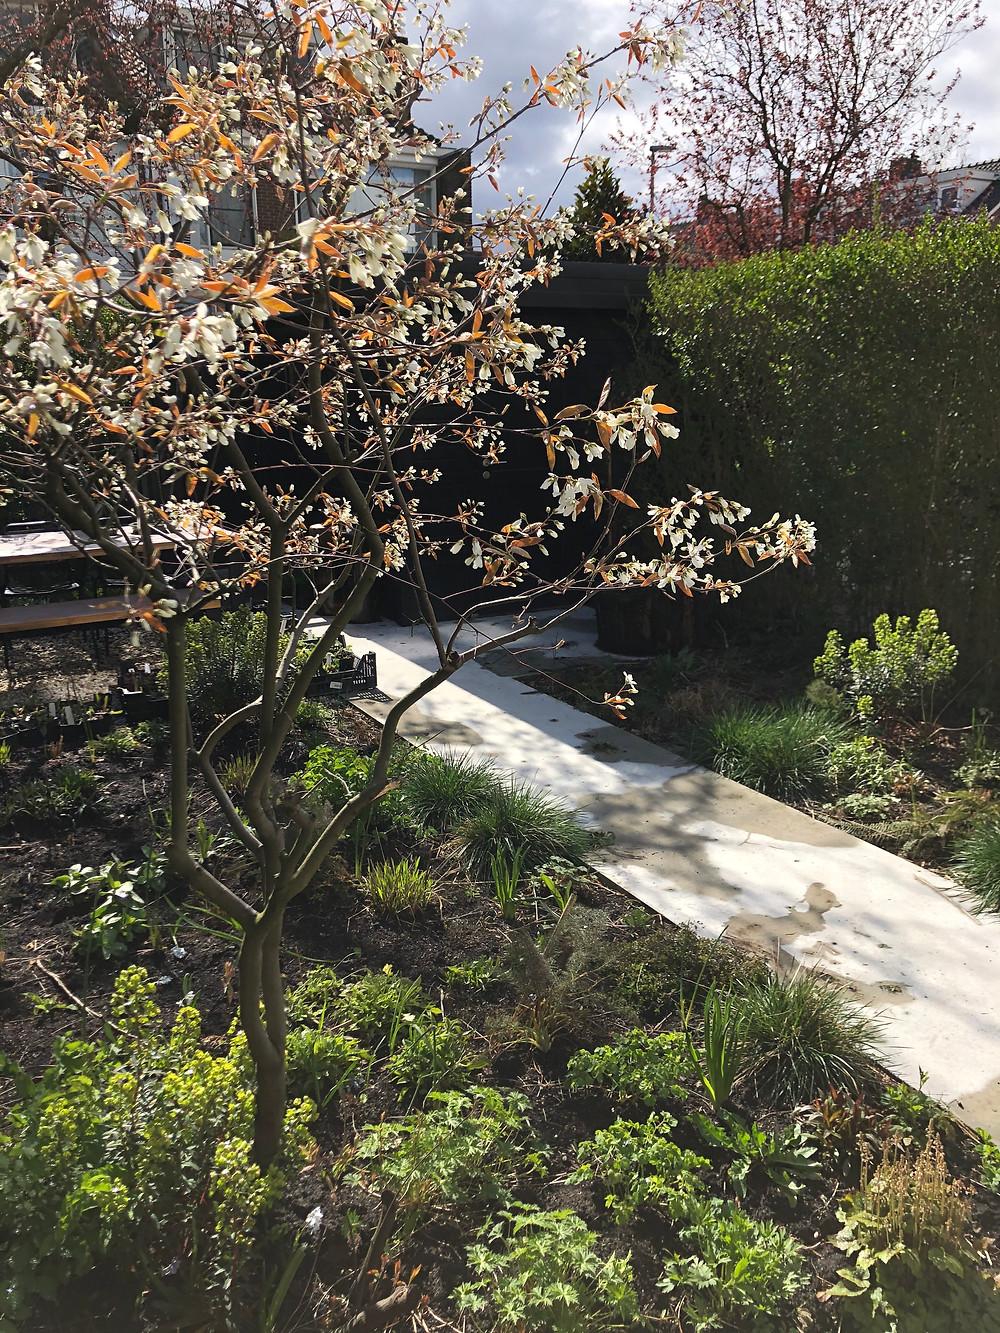 Lente in de tuin! Bloeiende Amelachier lamarckii en Euphorbia x martinii